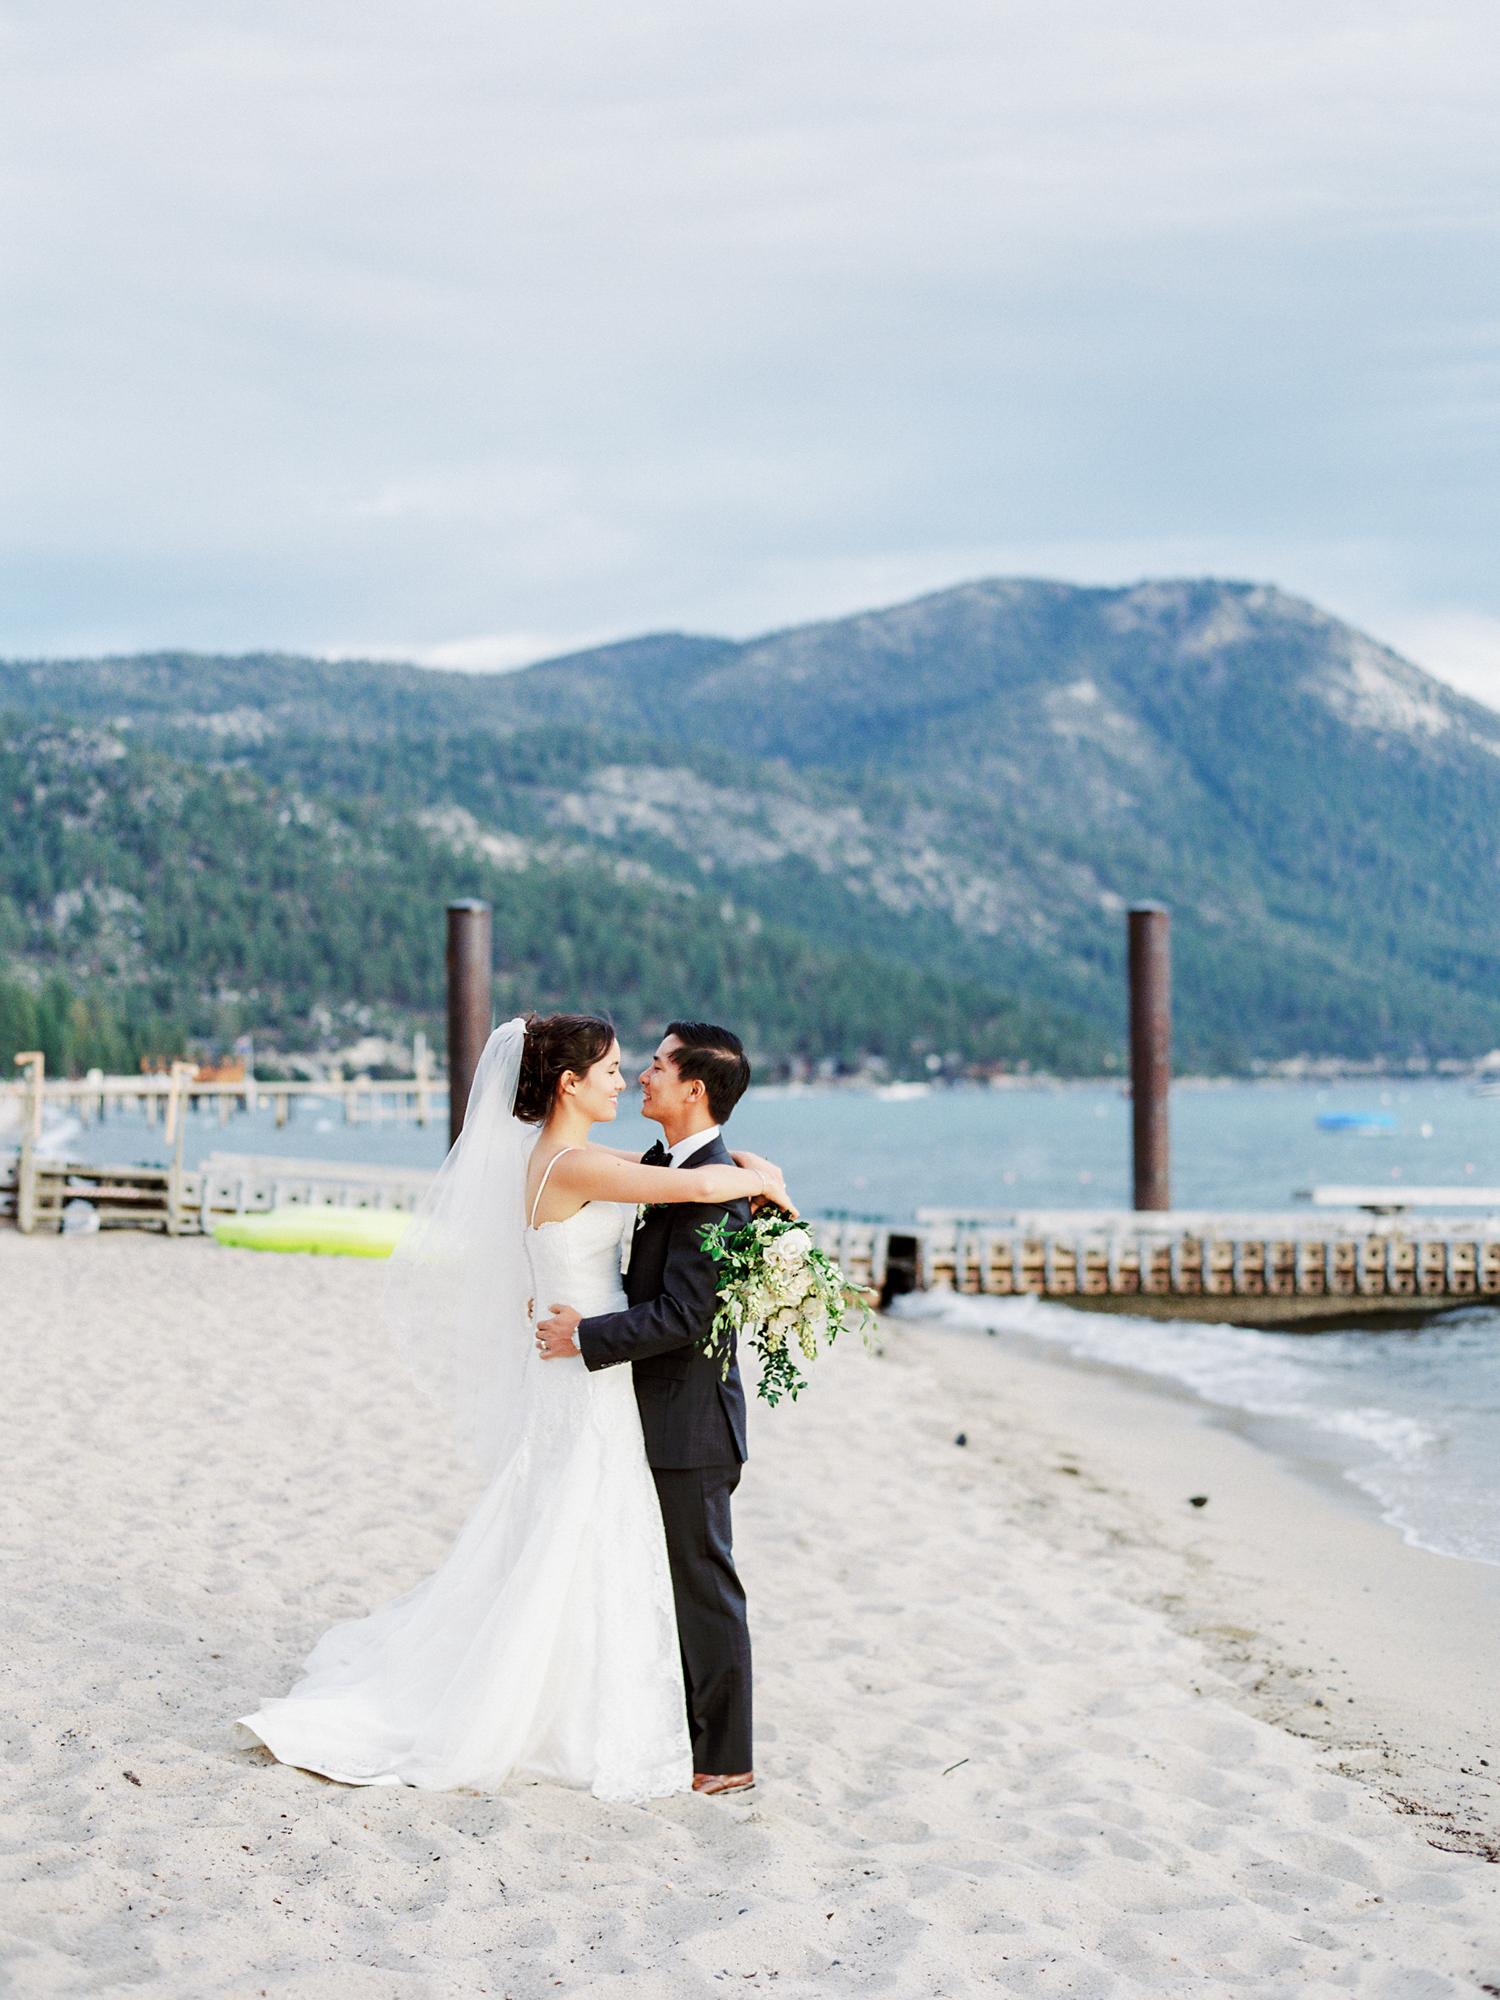 Lake tahoe wedding photographer at Hyatt Regency Lake Tahoe Resort